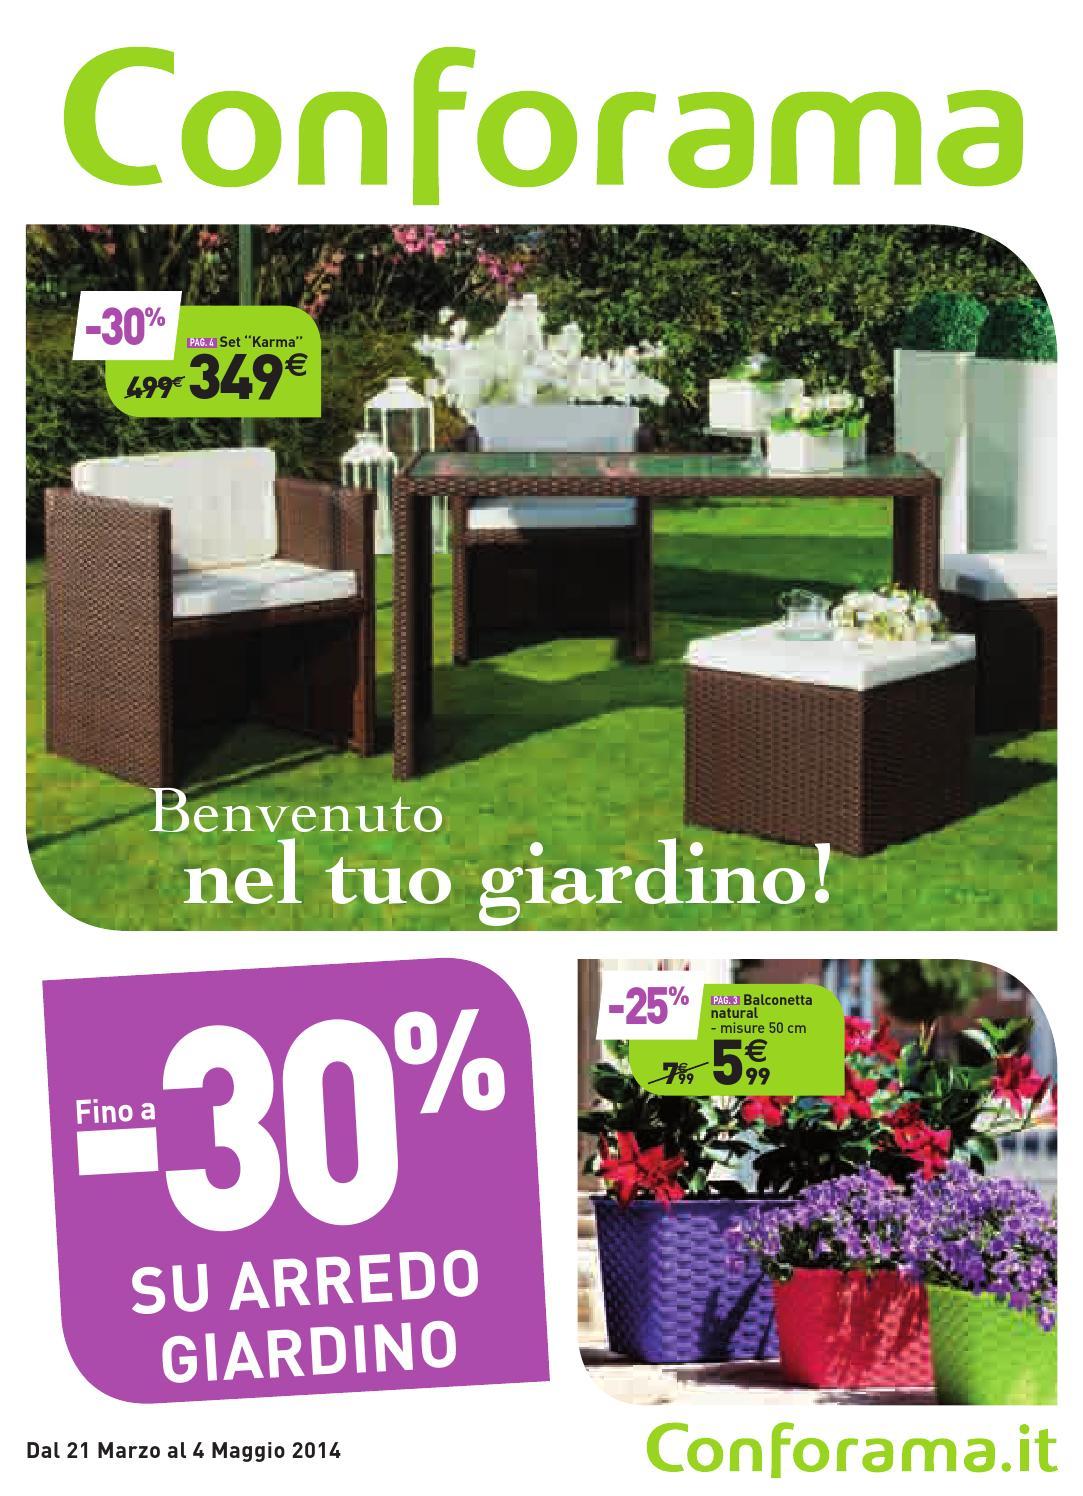 Conforama garden 2014confo by catalogofree issuu for Conforama arredo giardino